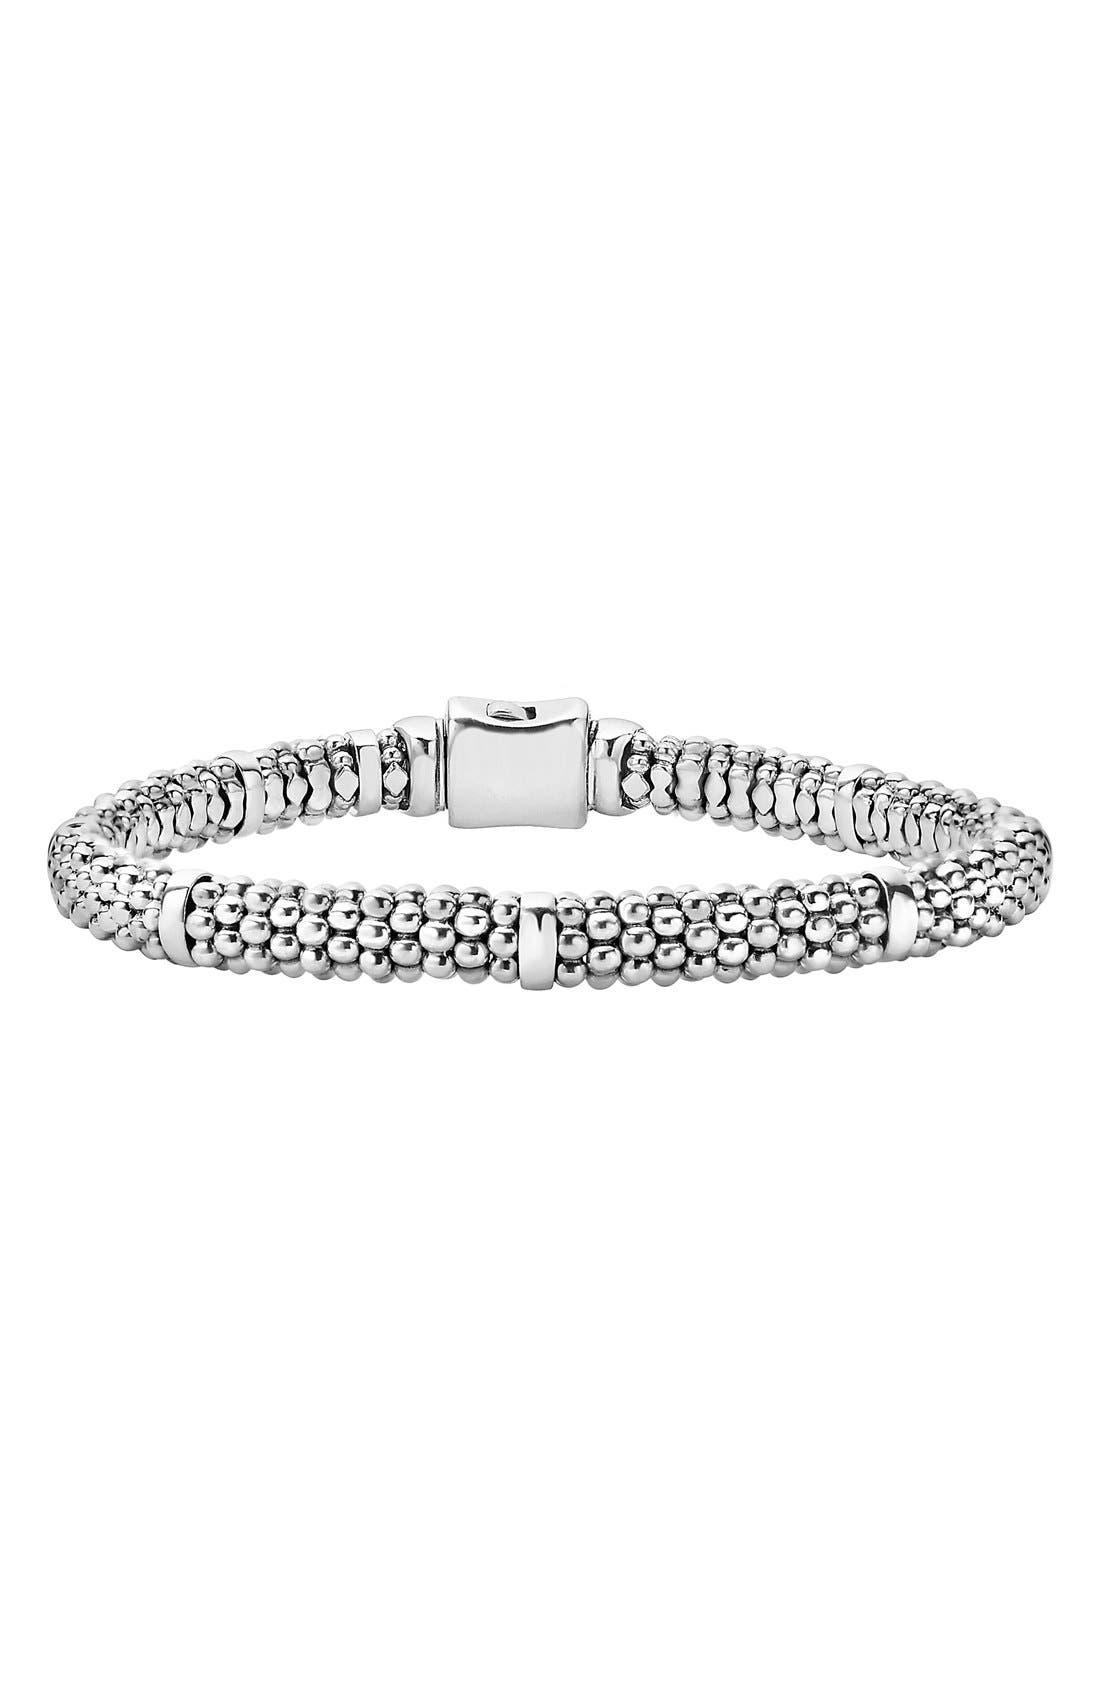 Caviar Rope Station Bracelet,                         Main,                         color, 040